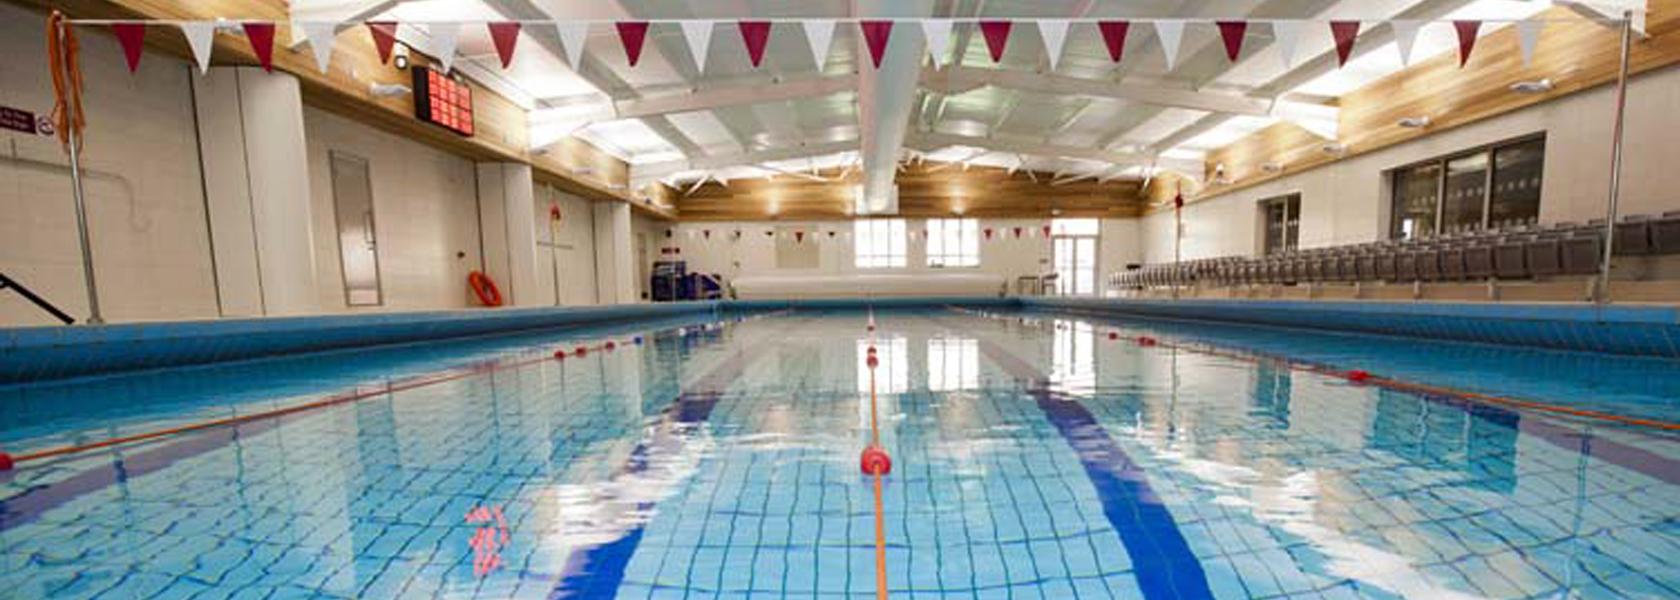 Sports Centre Bromsgrove School